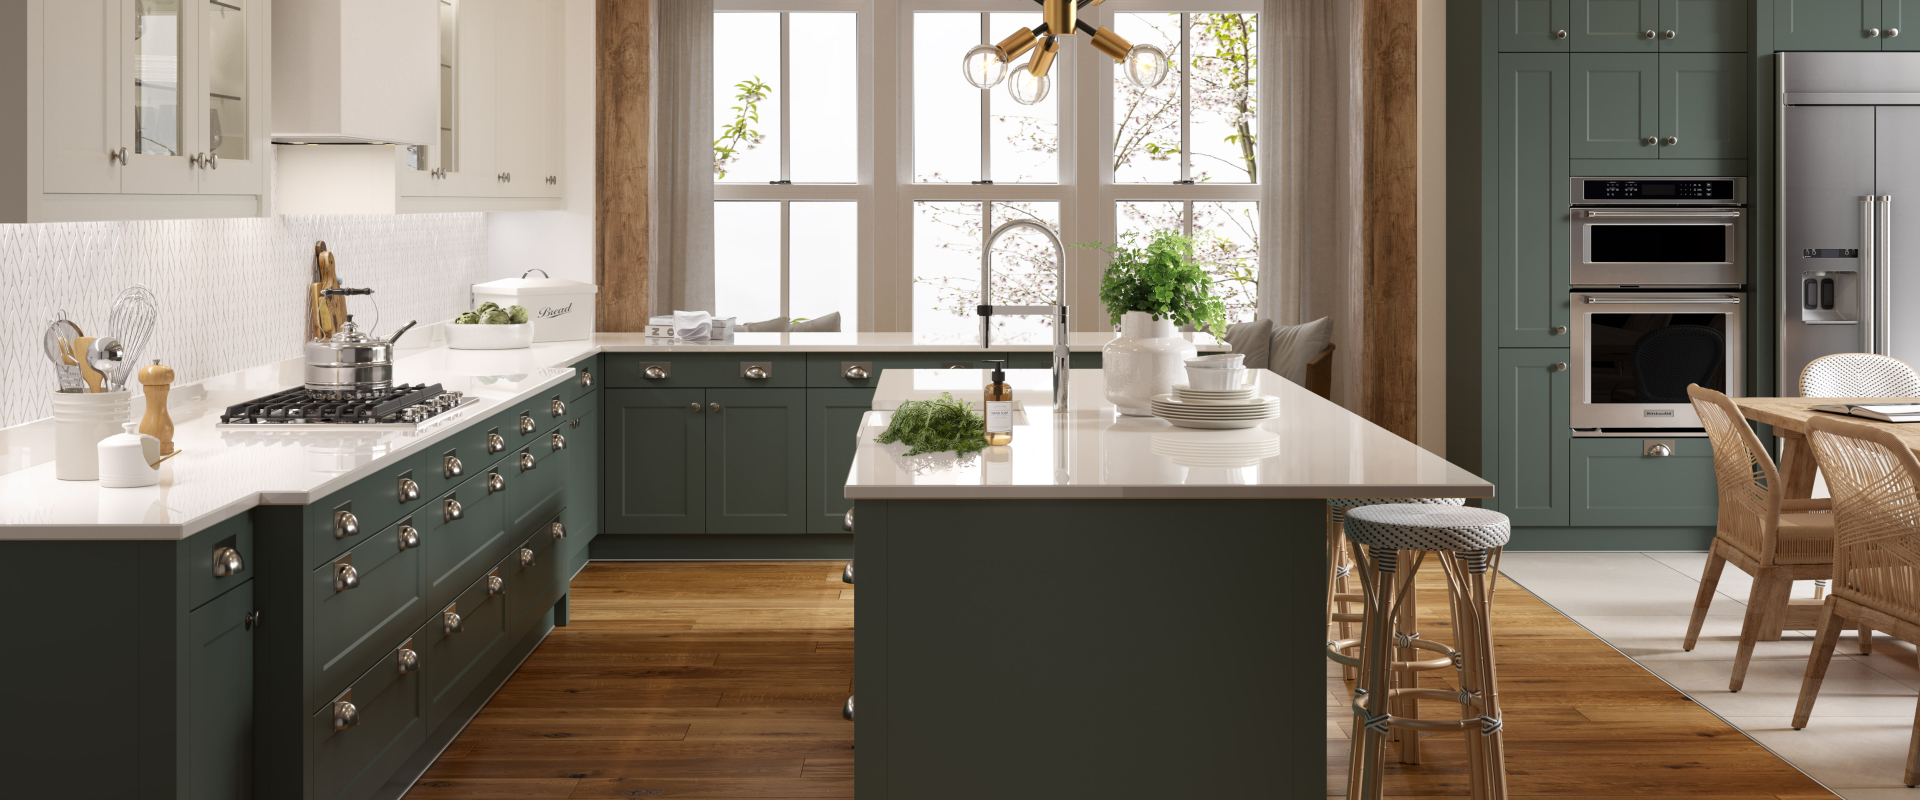 Shaker Chelsea Kitchen In Forest Green Matte Wren Kitchens